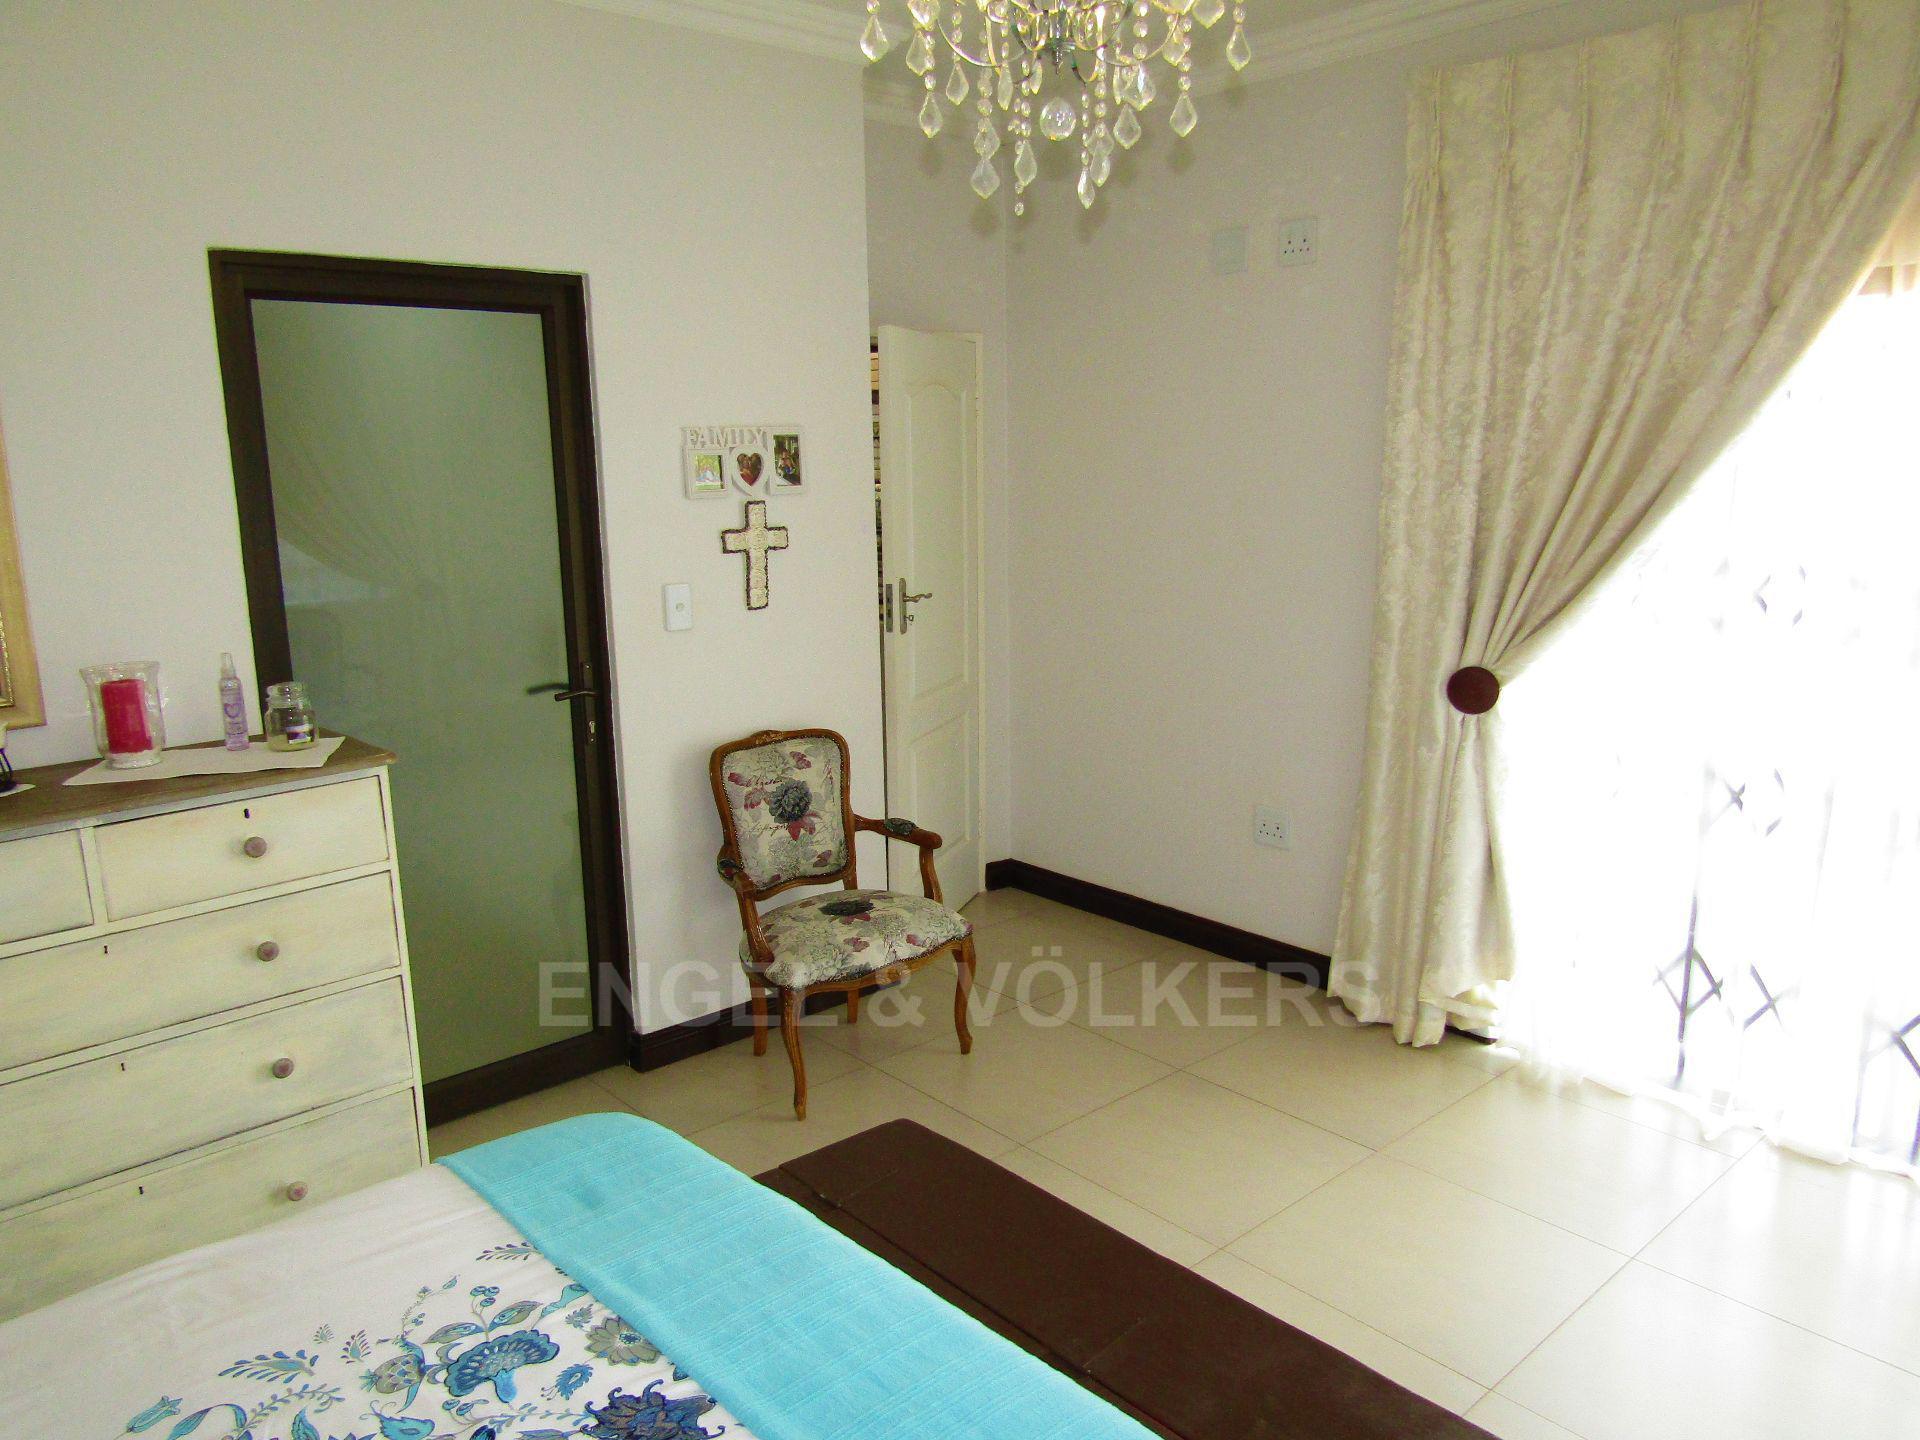 Lifestyle Estate property for sale. Ref No: 13458759. Picture no 15